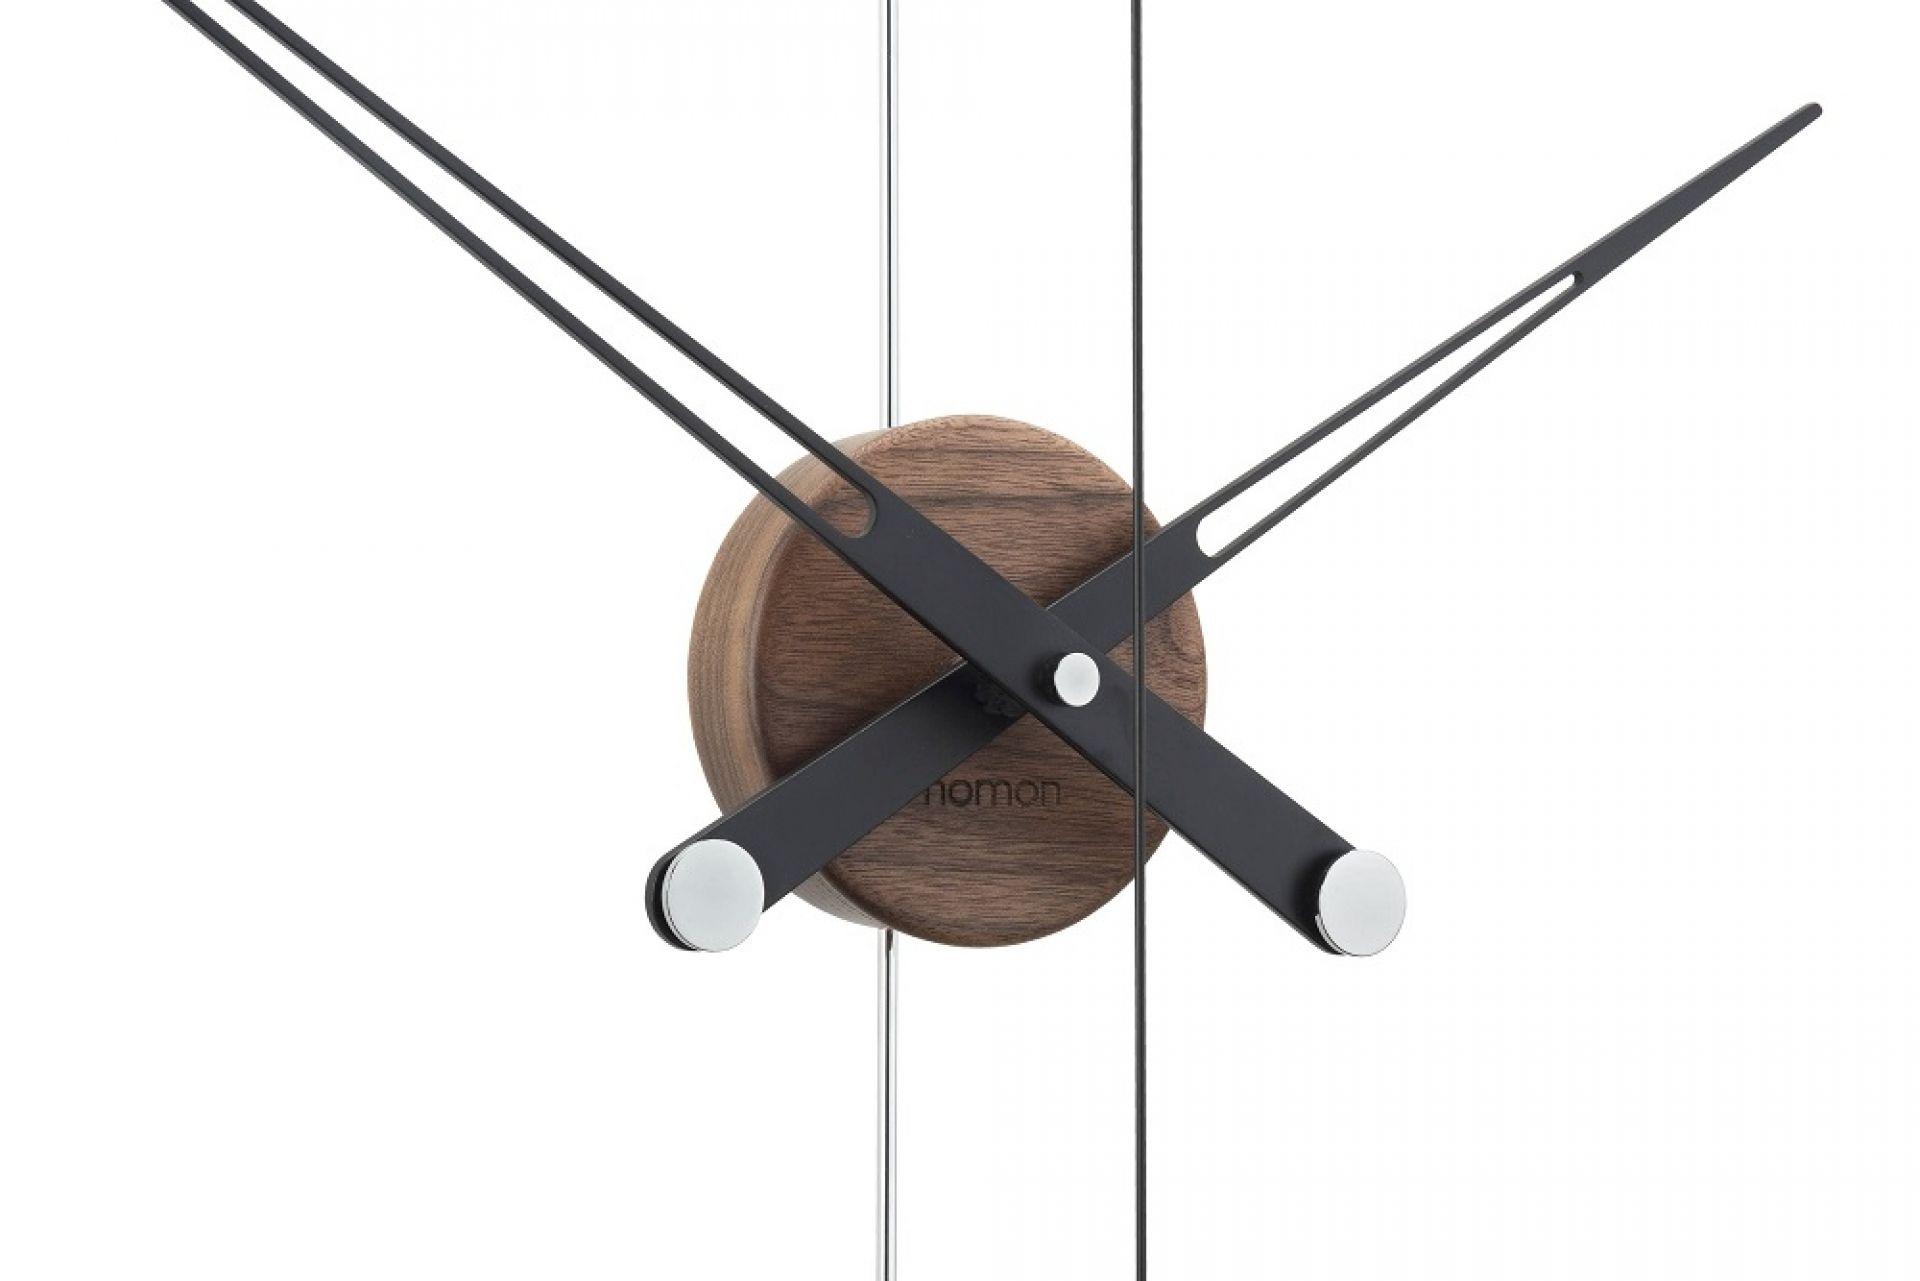 Barcelona Clock Wanduhr nomon